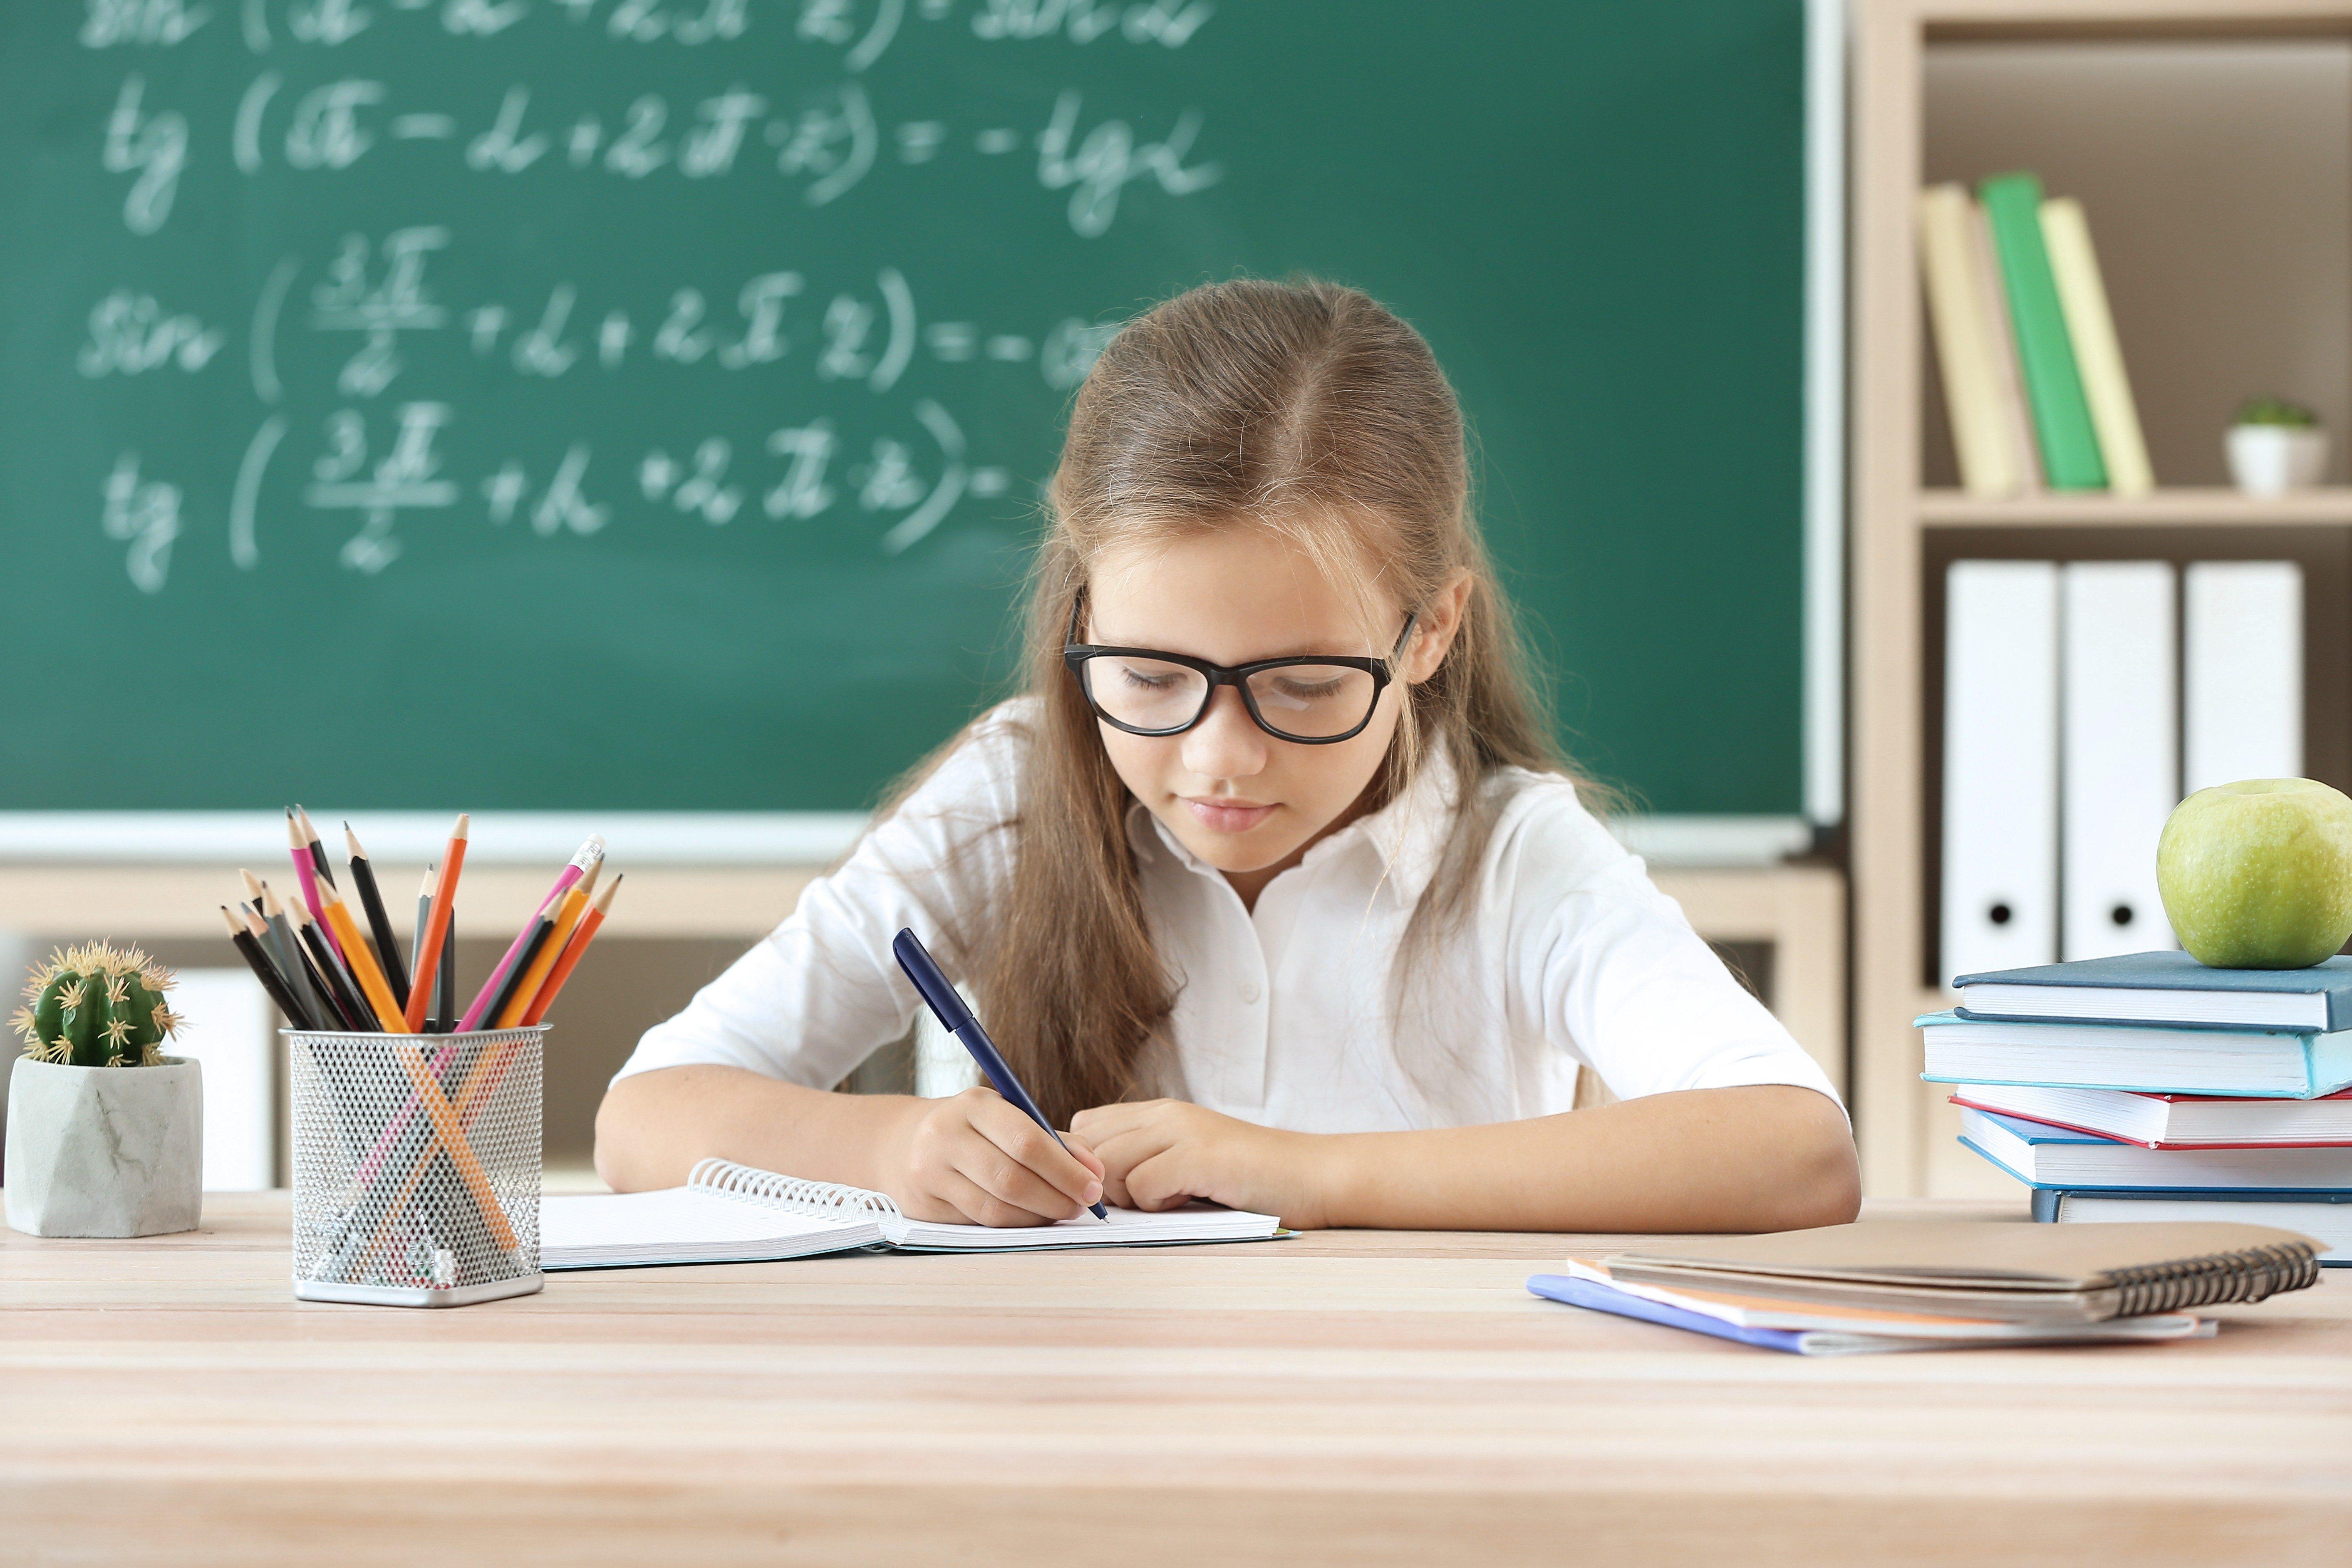 Little girl doing lessons in classroom; Shutterstock ID 1457601527; Job (TFH, TOH, RD, BNB, CWM, CM): RD